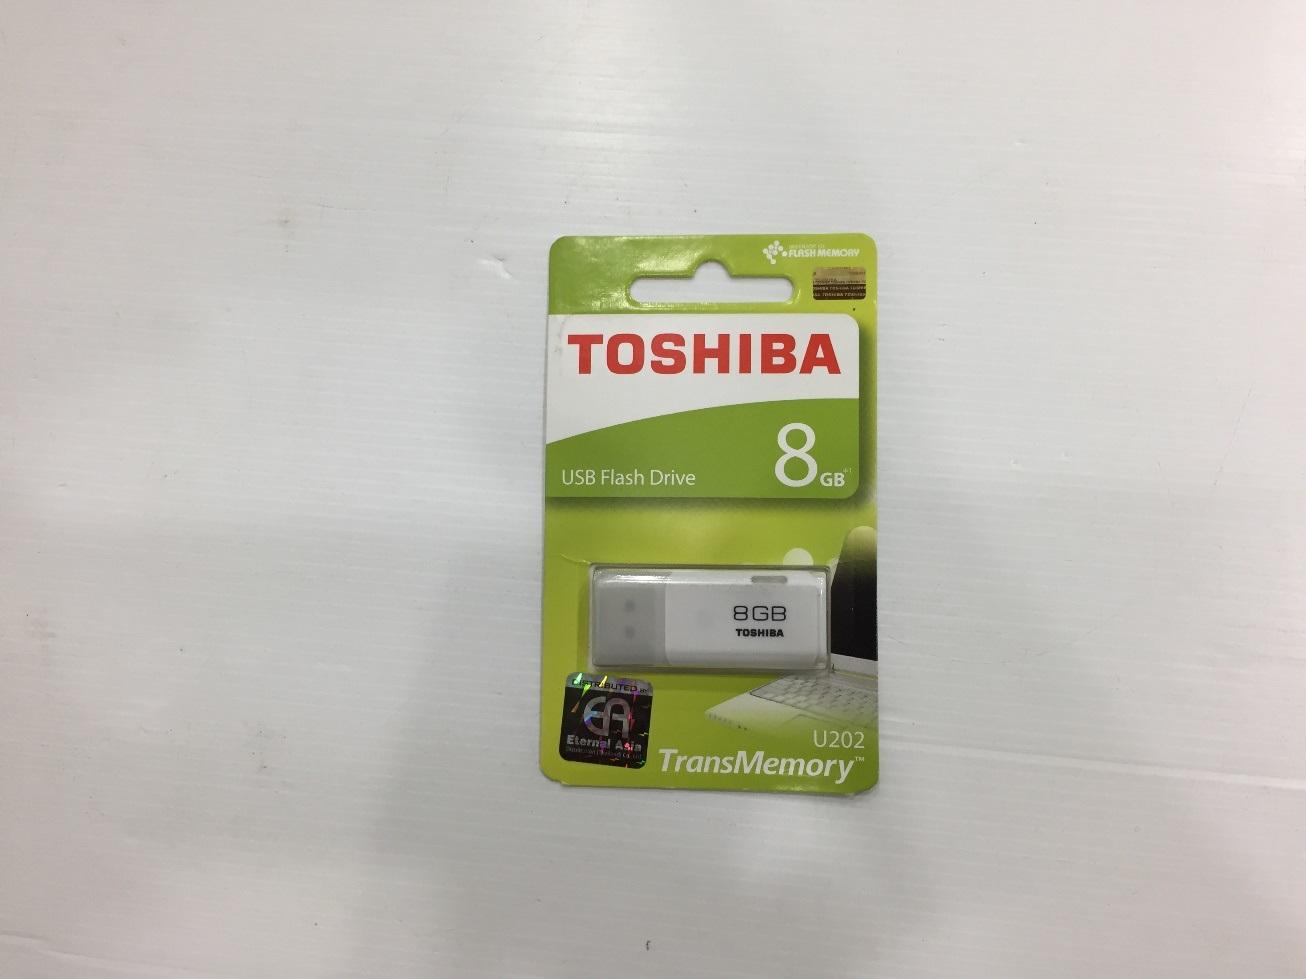 Toshiba 8GB USB2.0 Flash Drive